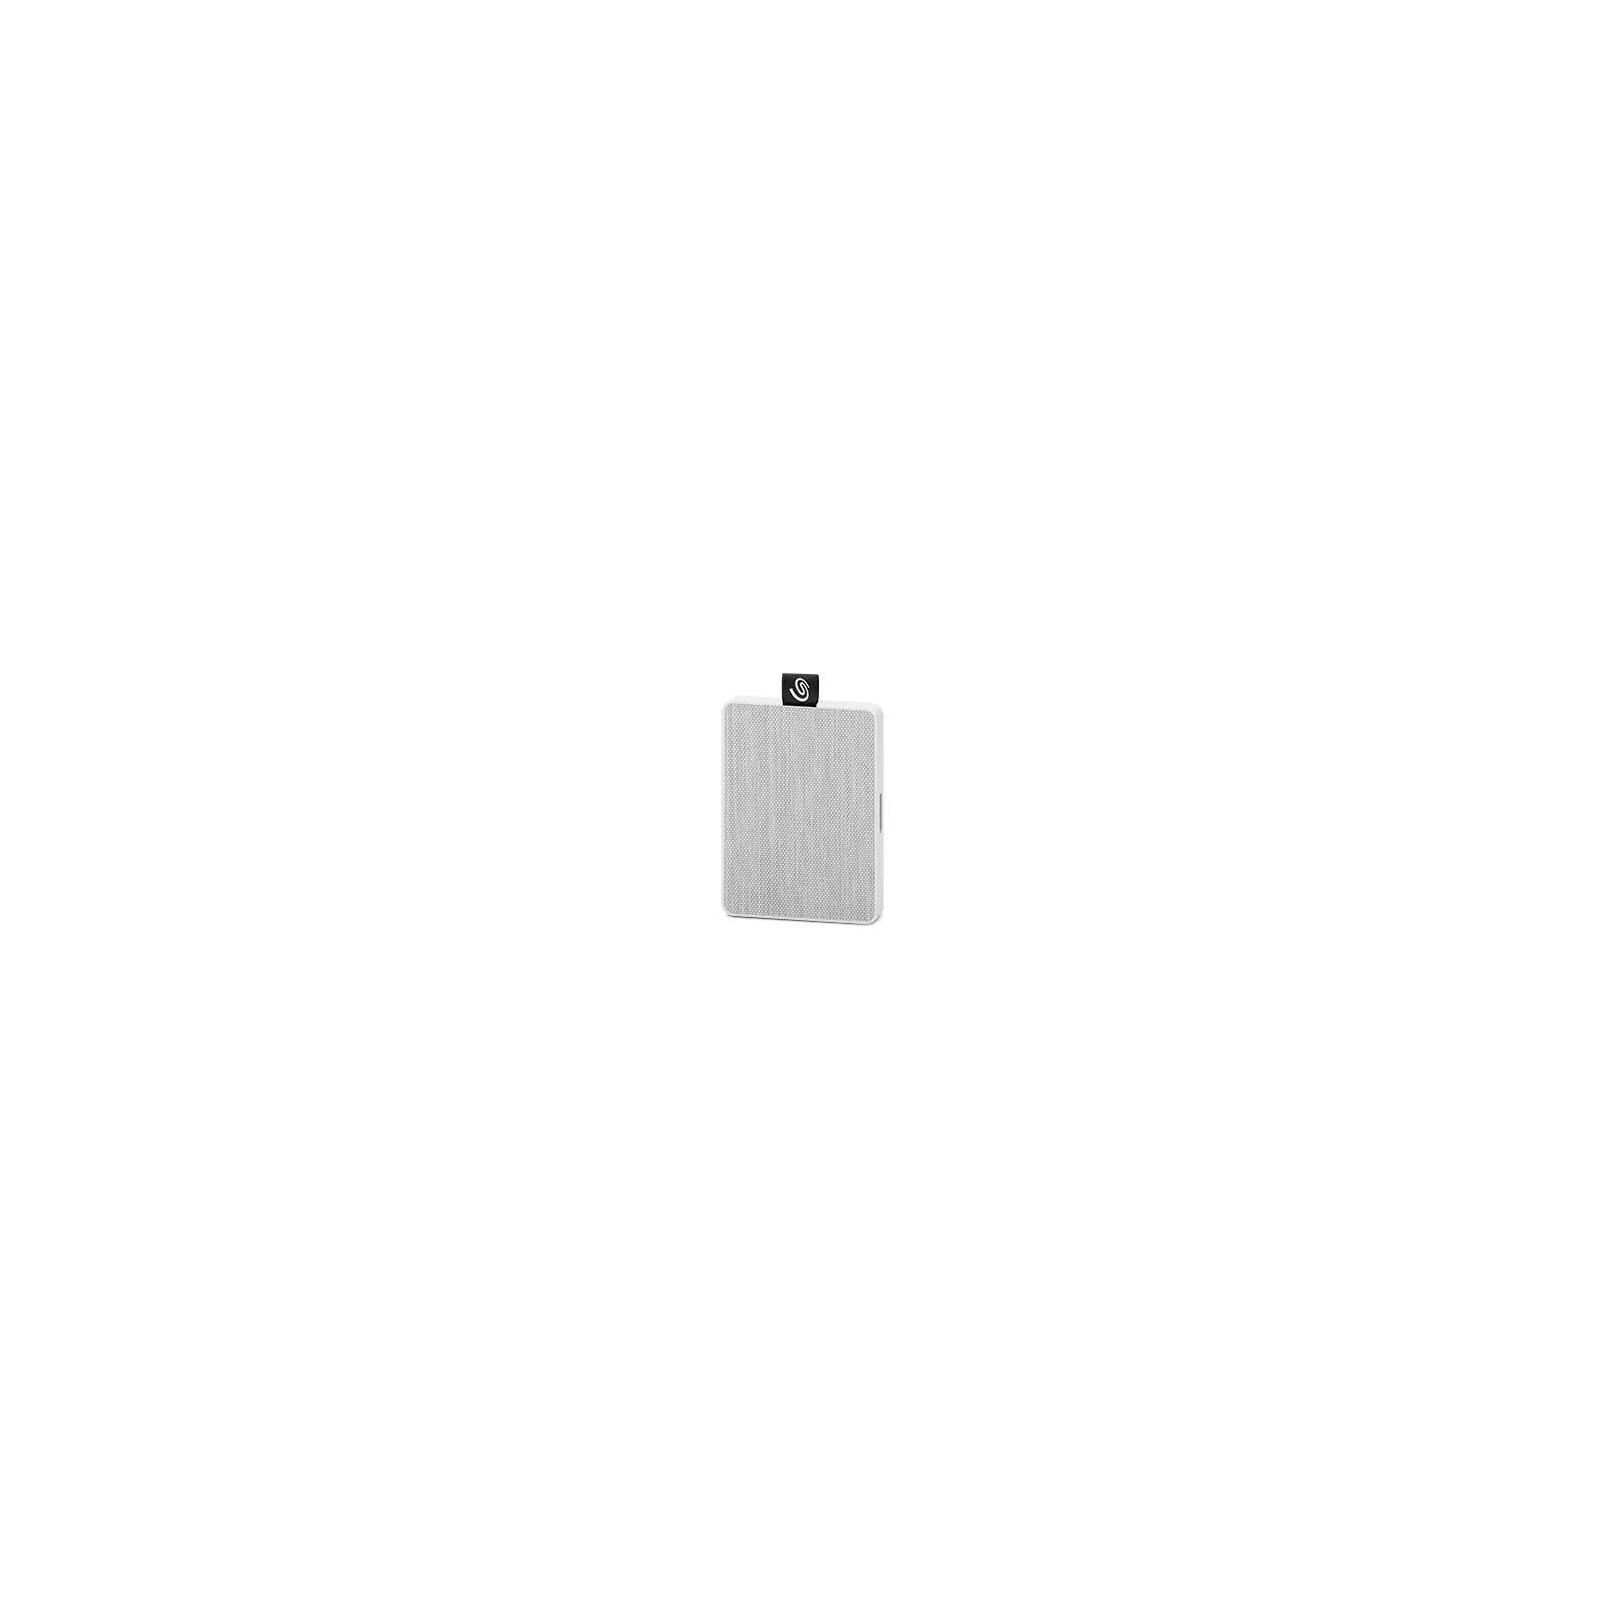 Seagate One Touch SSD 1TB extern USB 3.0 weiß